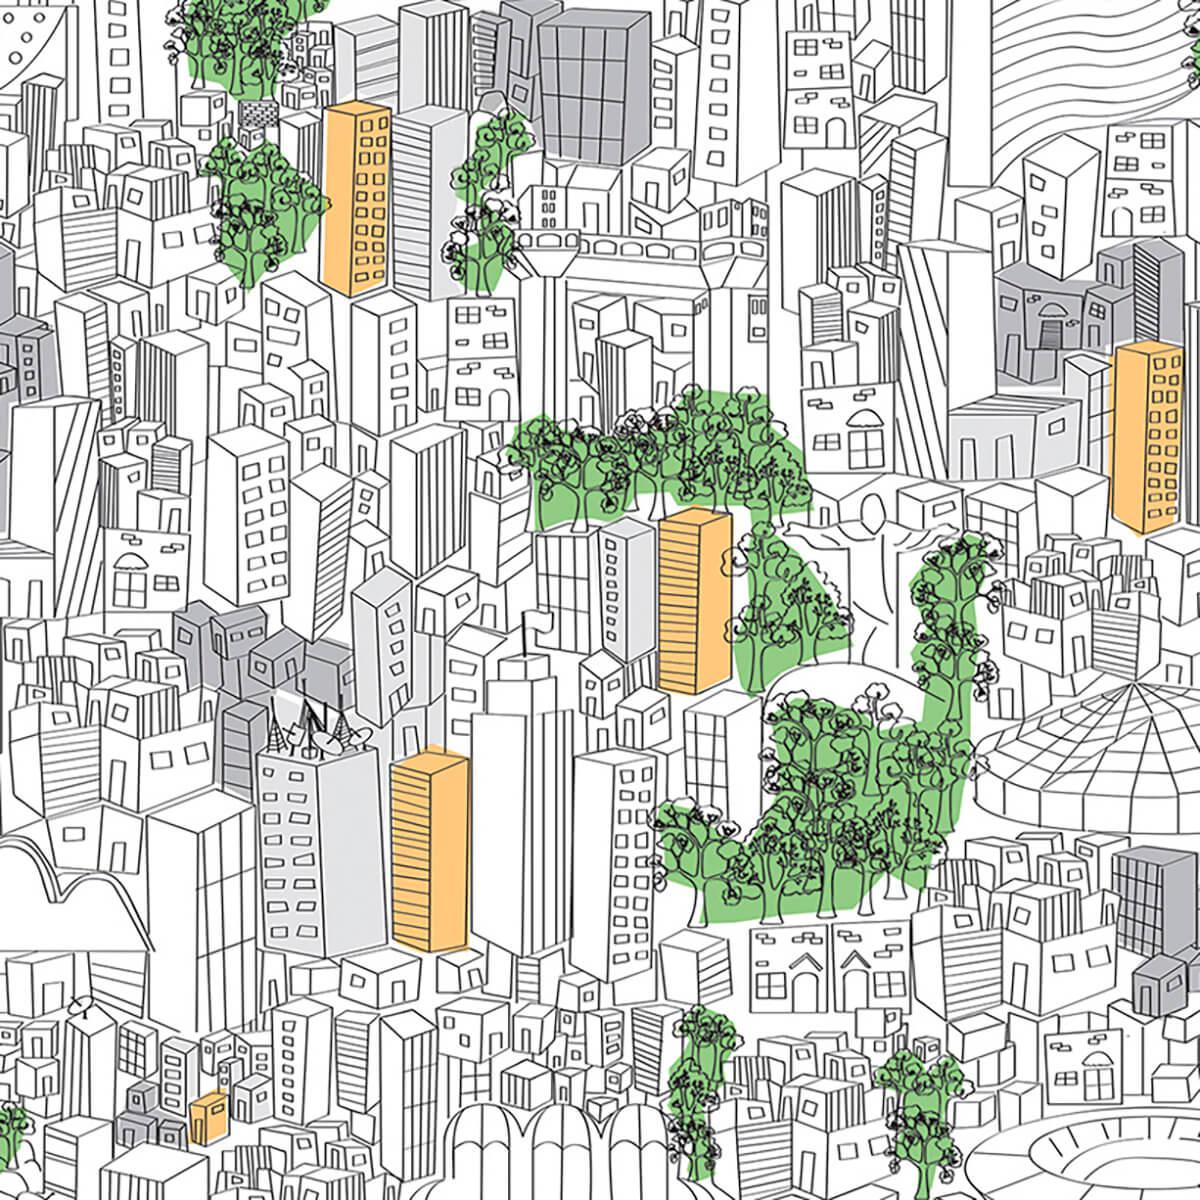 Papel de parede metrópole   Marcelo Rosenbaum